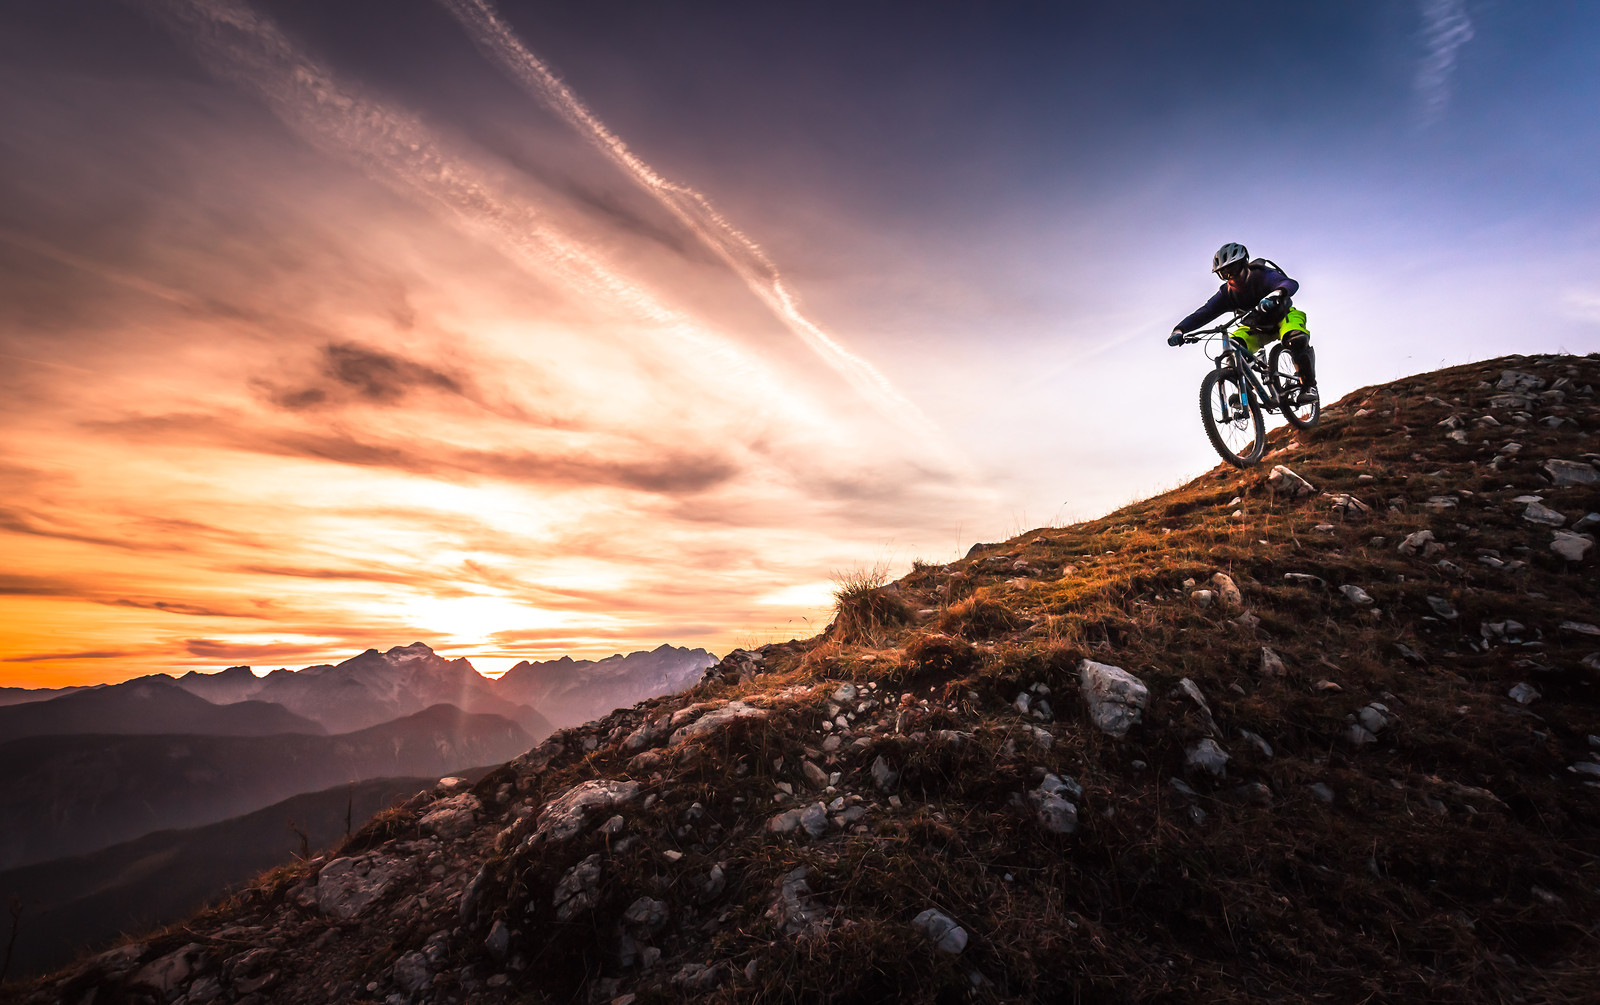 Sunset ride - berto - Mountain Biking Pictures - Vital MTB